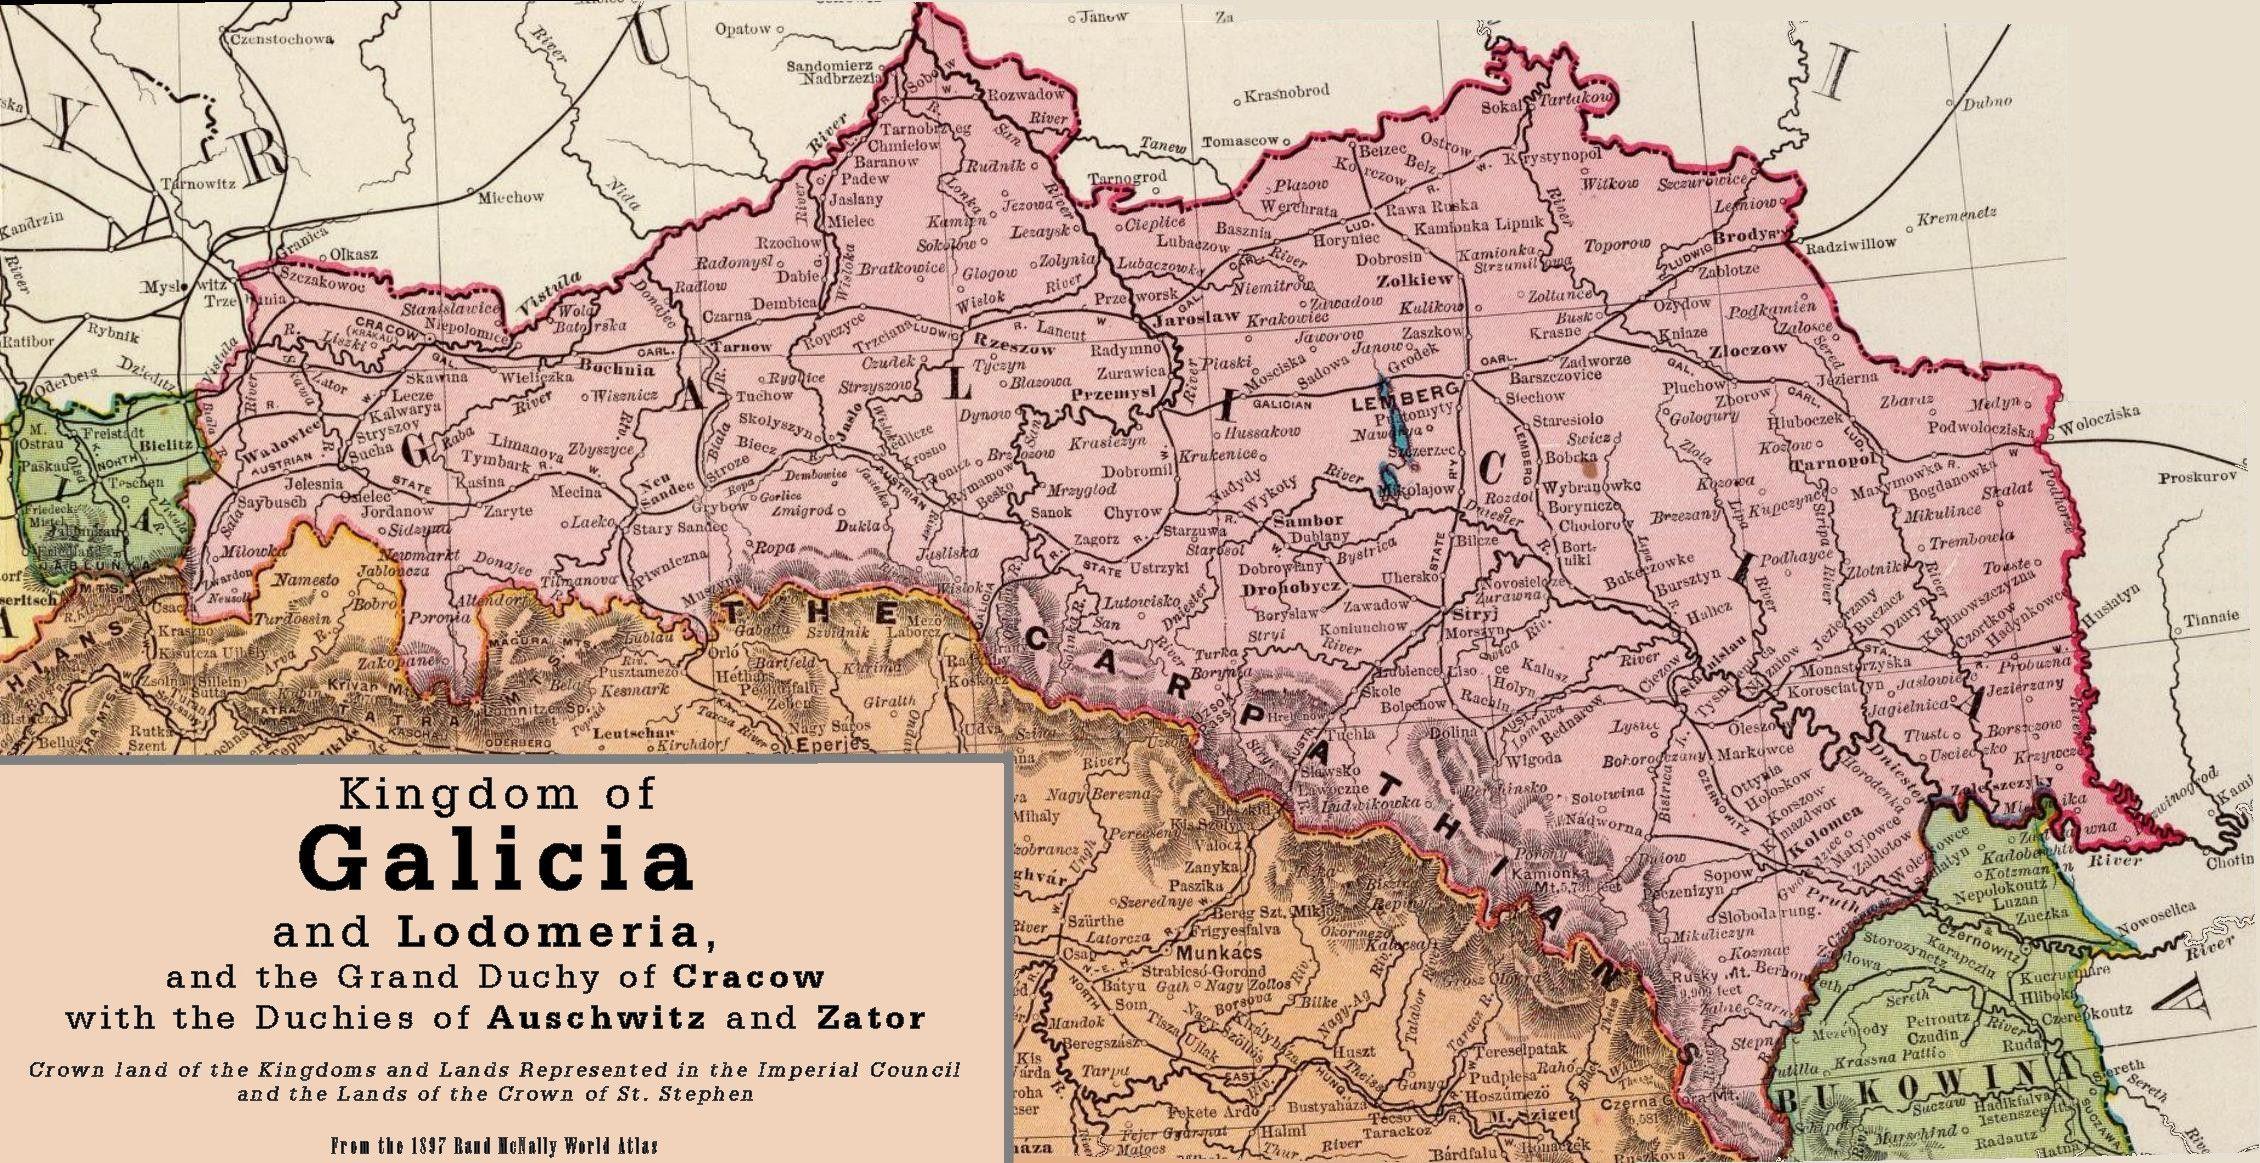 Kingdom of Galicia and Lodomeria 1897 Kingdom